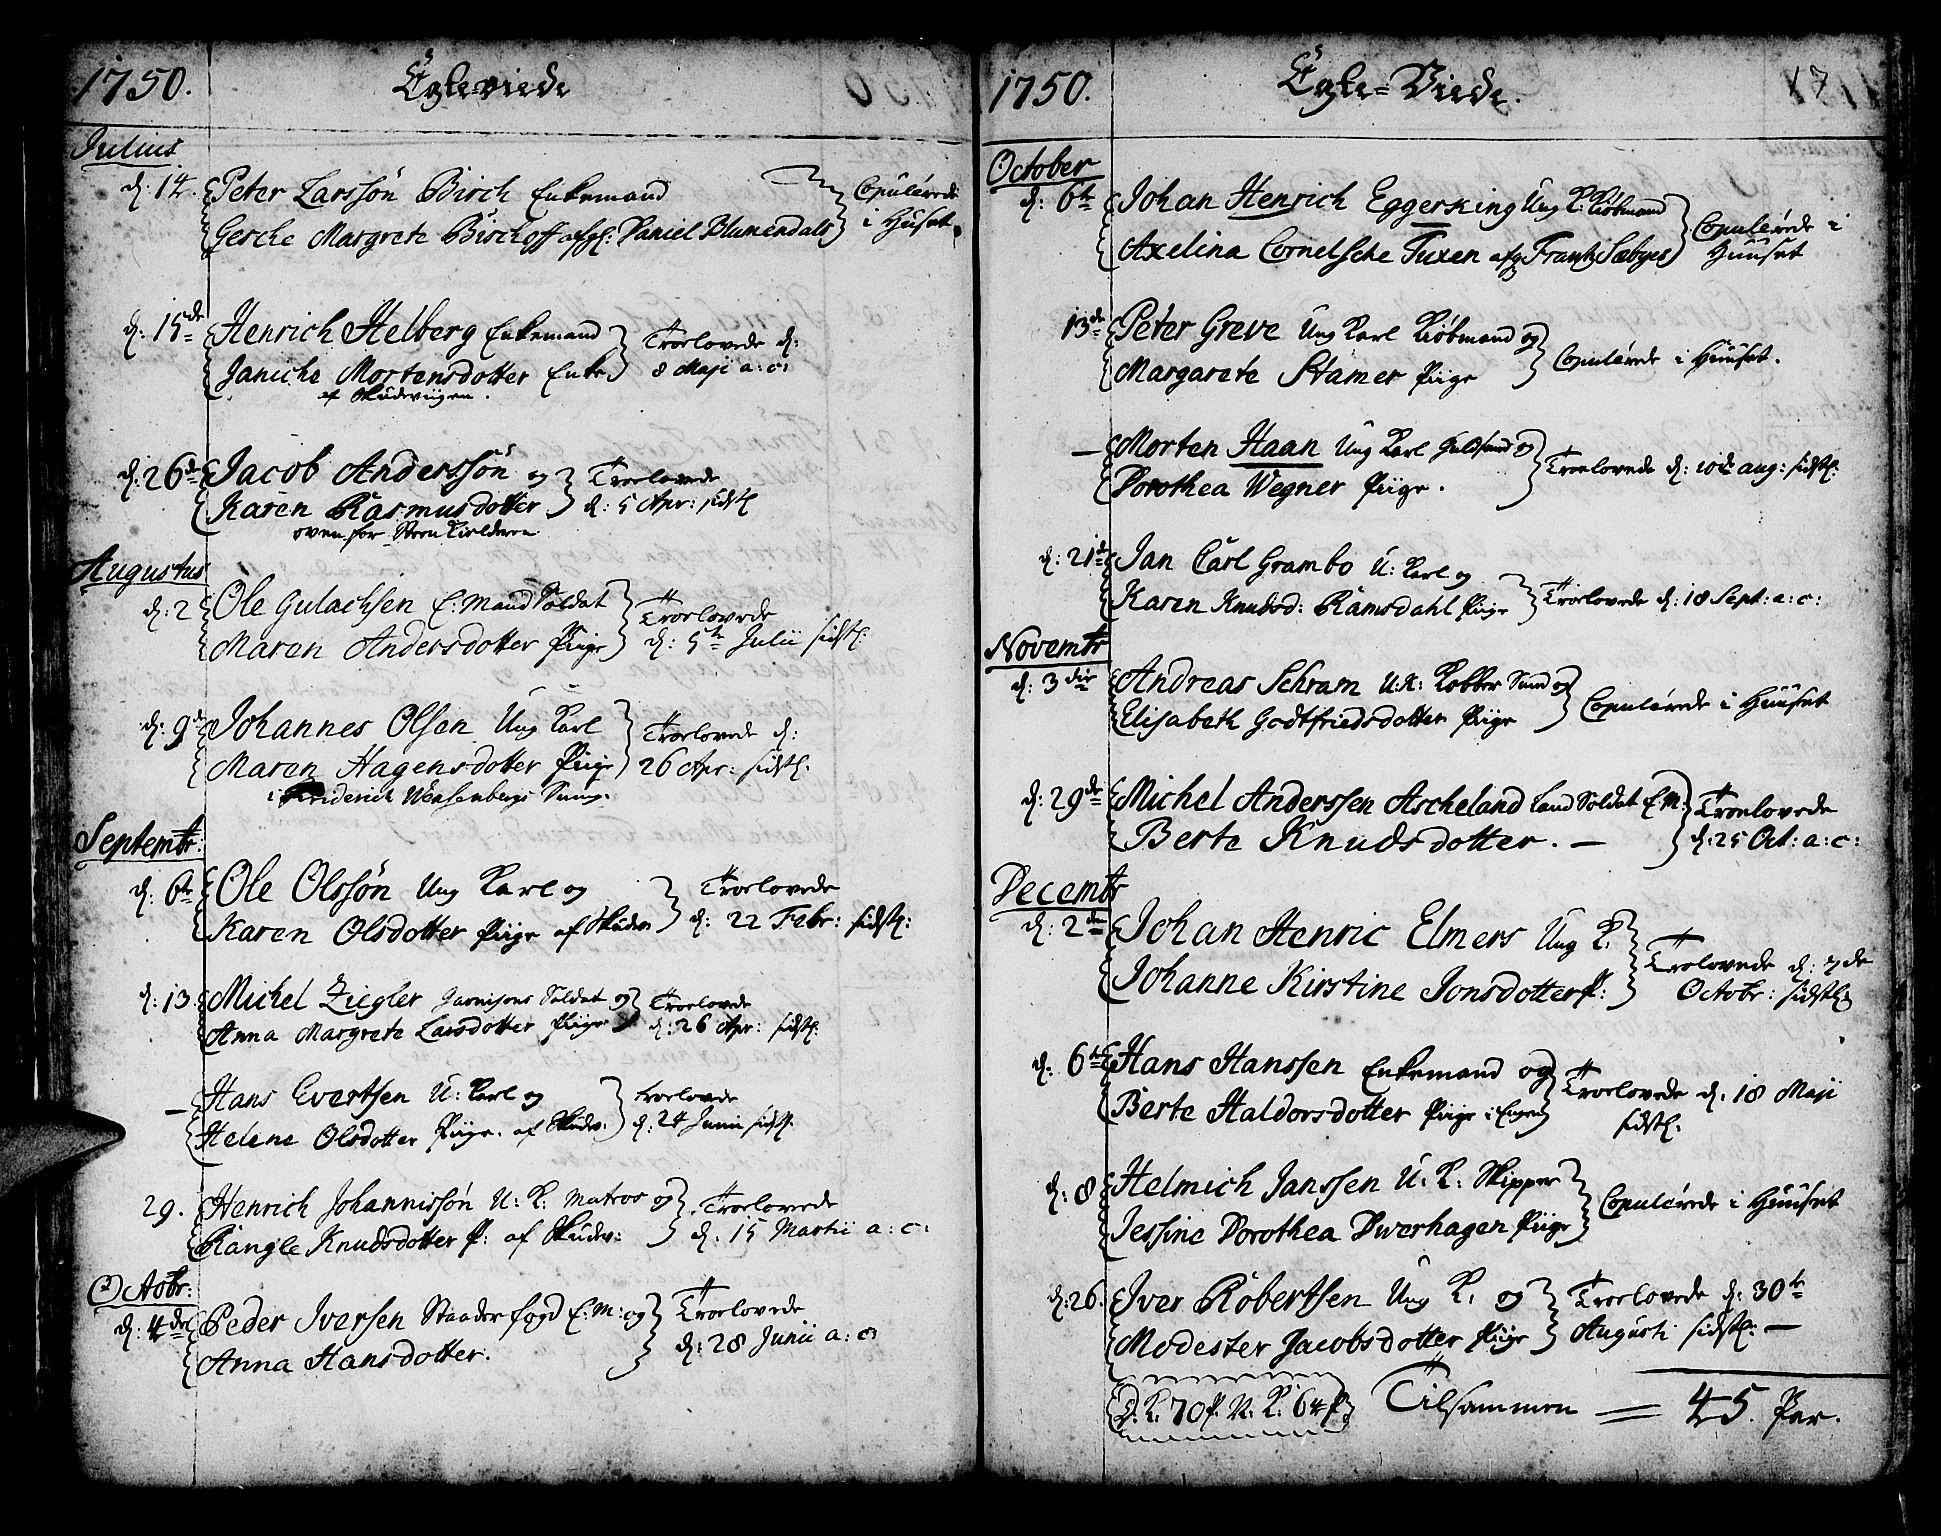 SAB, Korskirken Sokneprestembete, H/Haa/L0009: Ministerialbok nr. A 9, 1743-1861, s. 17